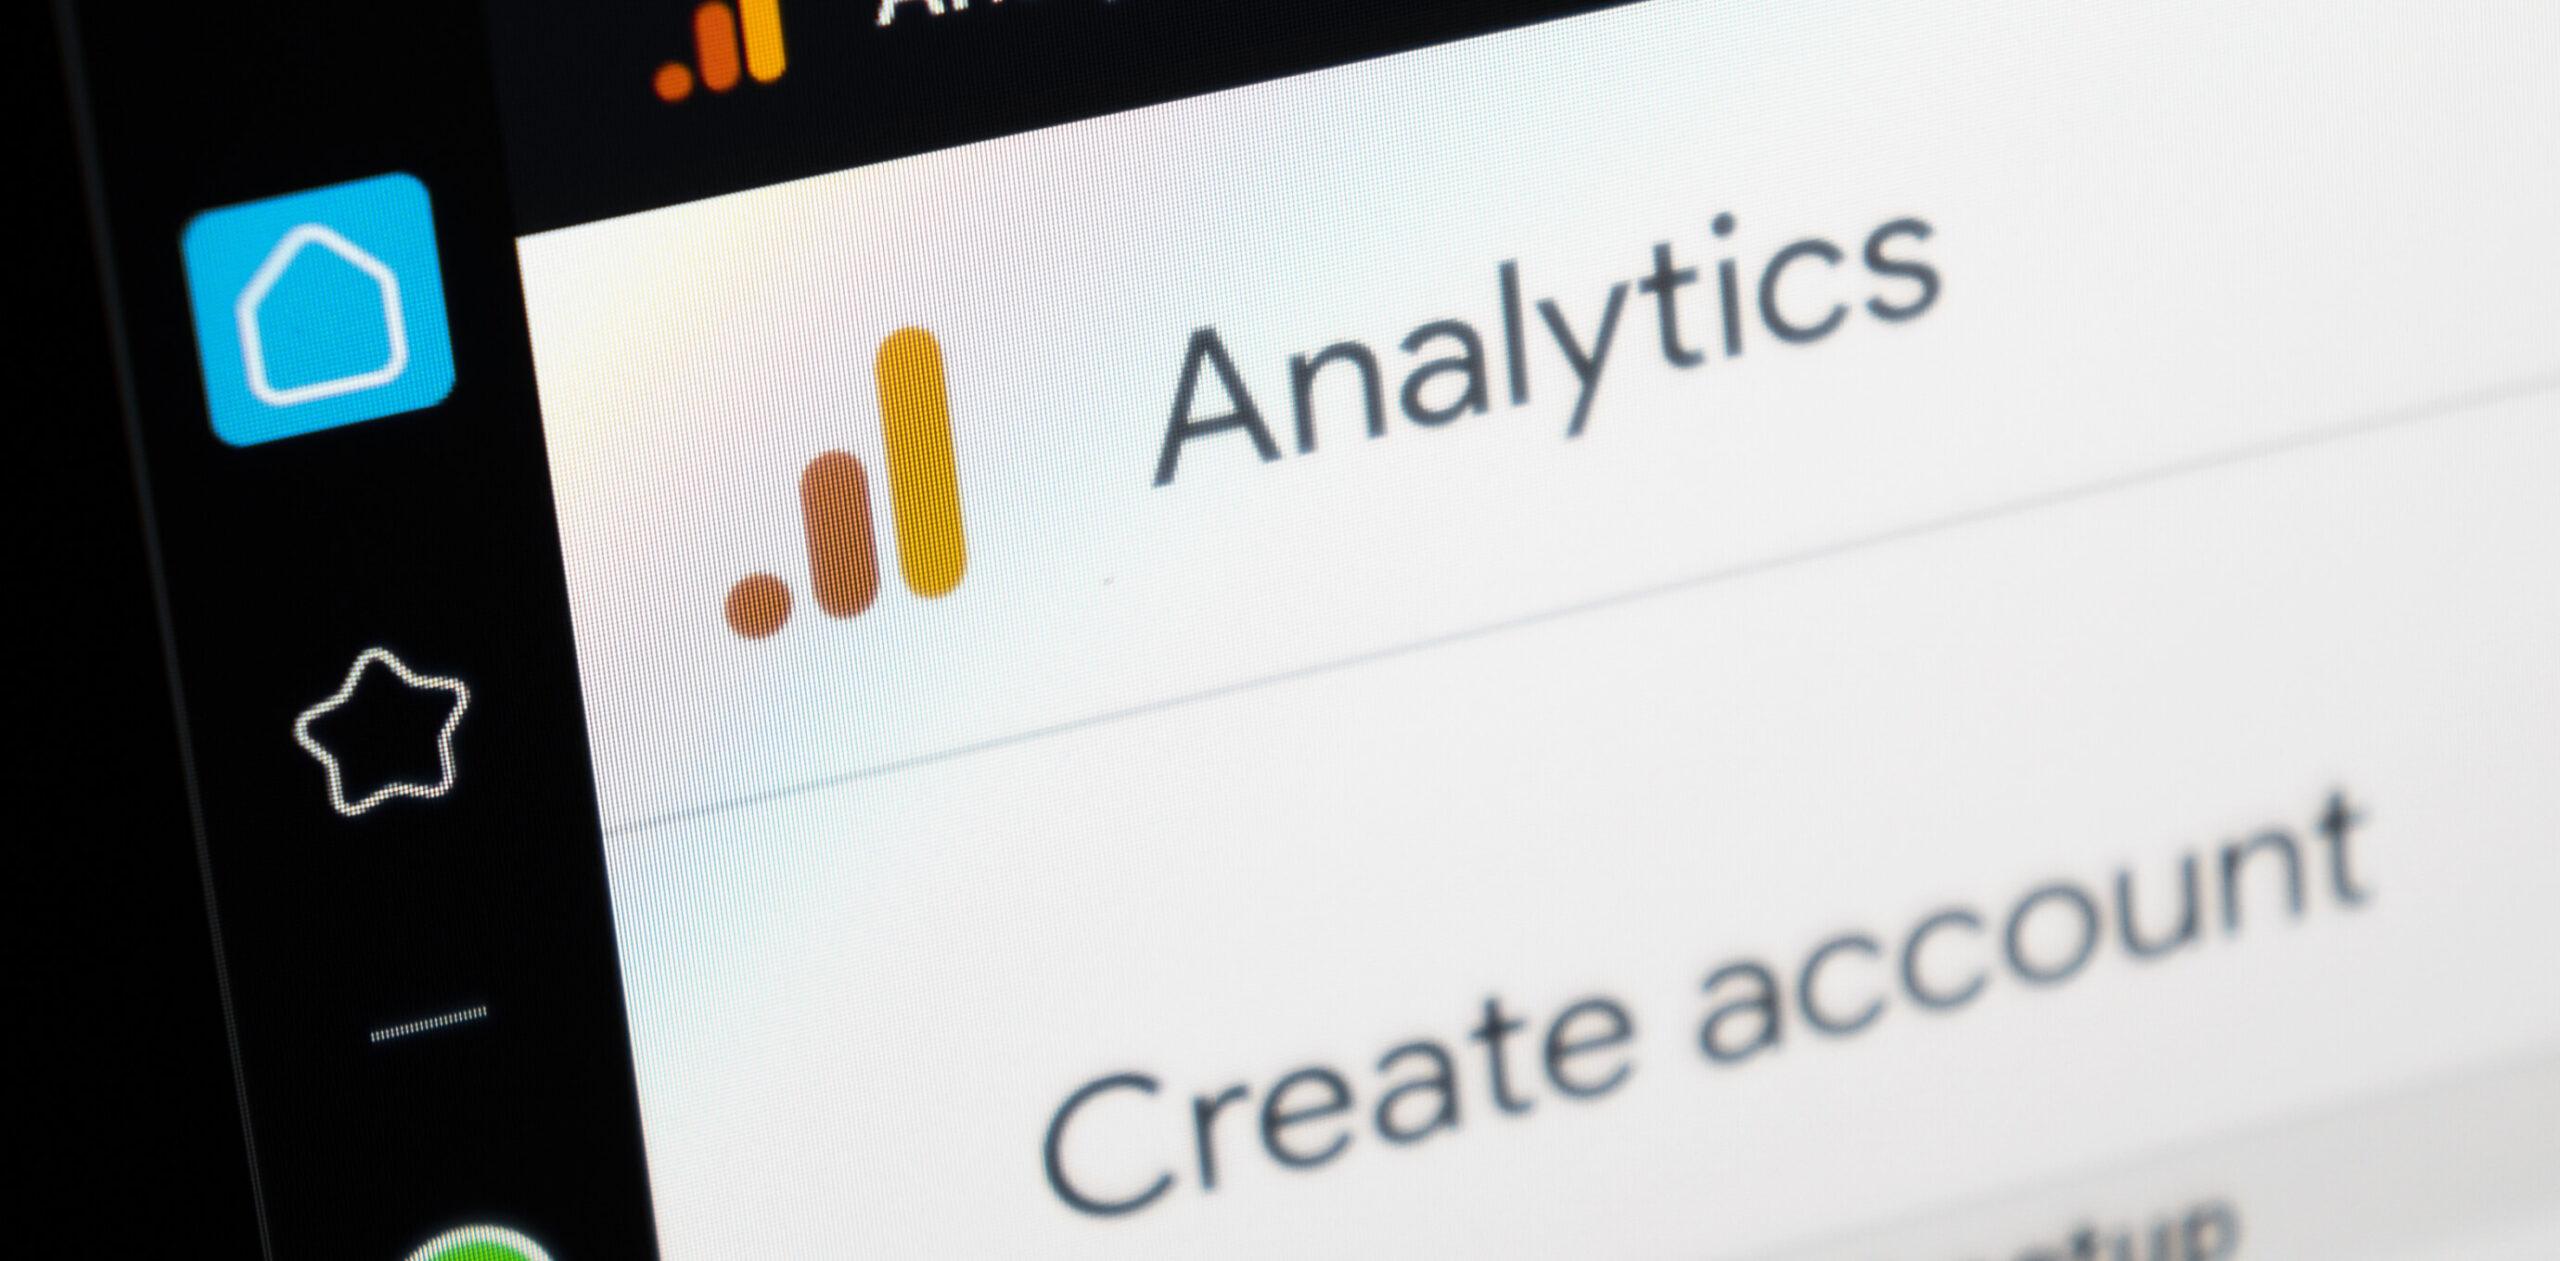 Googleアナリティクス4活用支援サービス